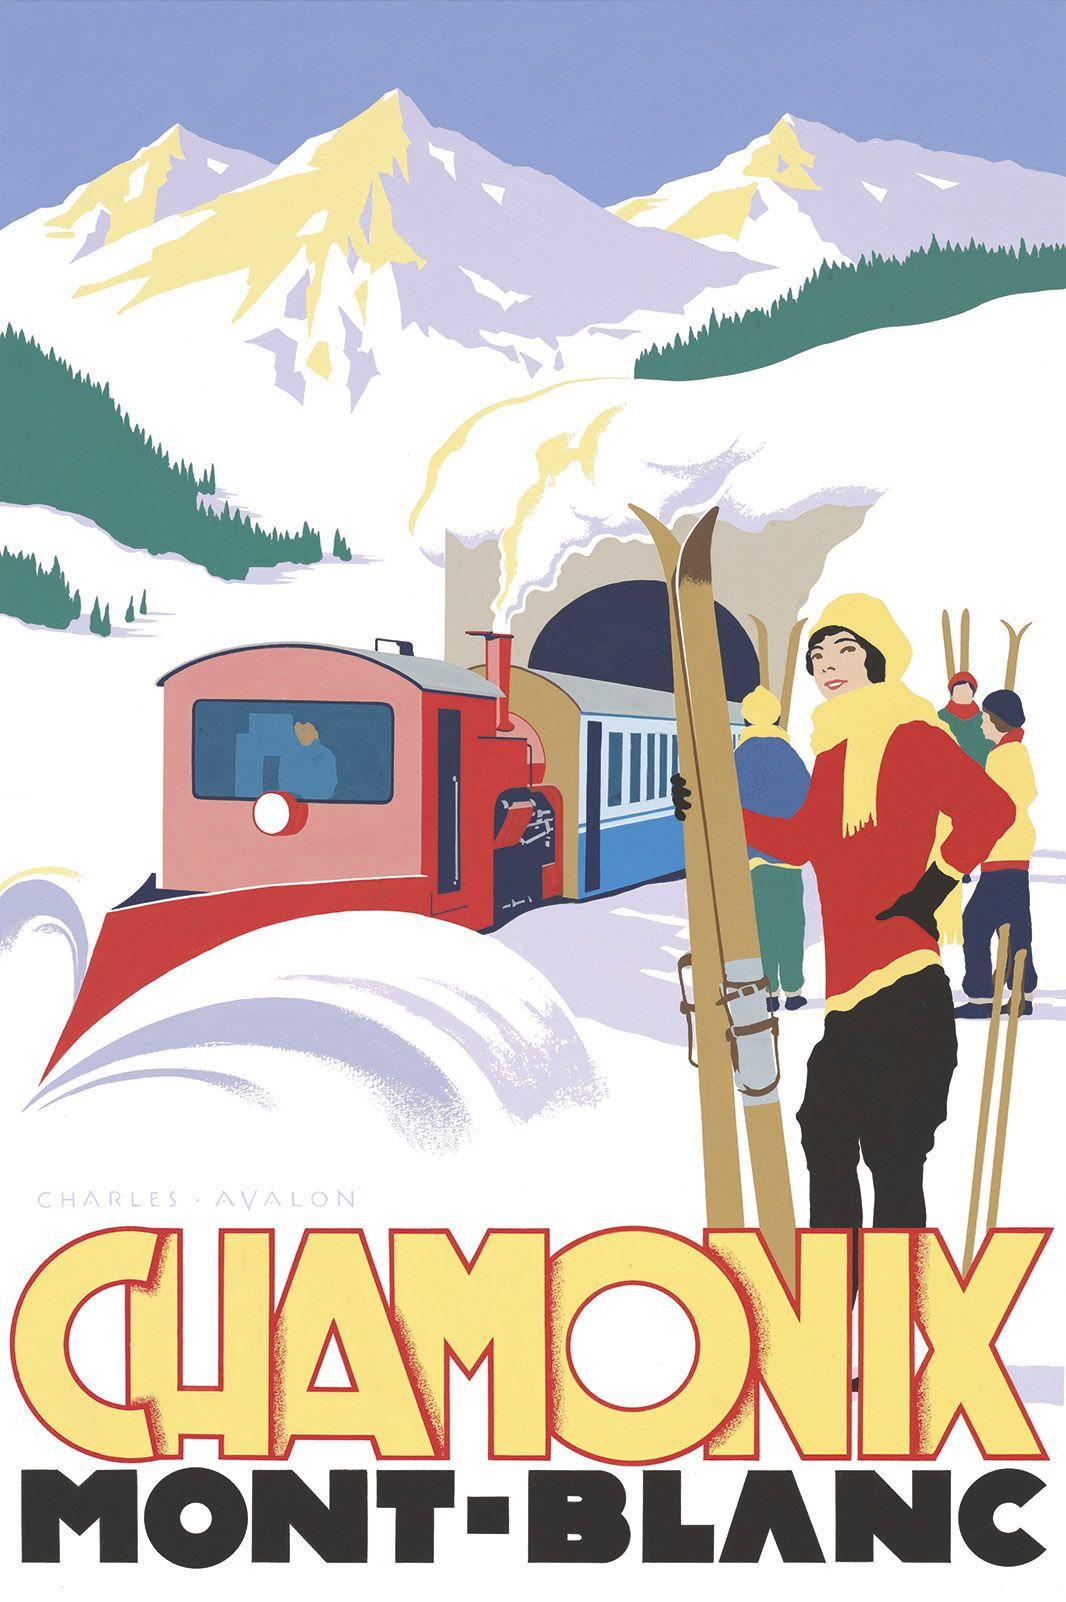 PEL121: 'Chamonix: Ski Train' - by Charles Avalon - Vintage travel posters - Winter Sports posters - Art Deco - Pullman Editions